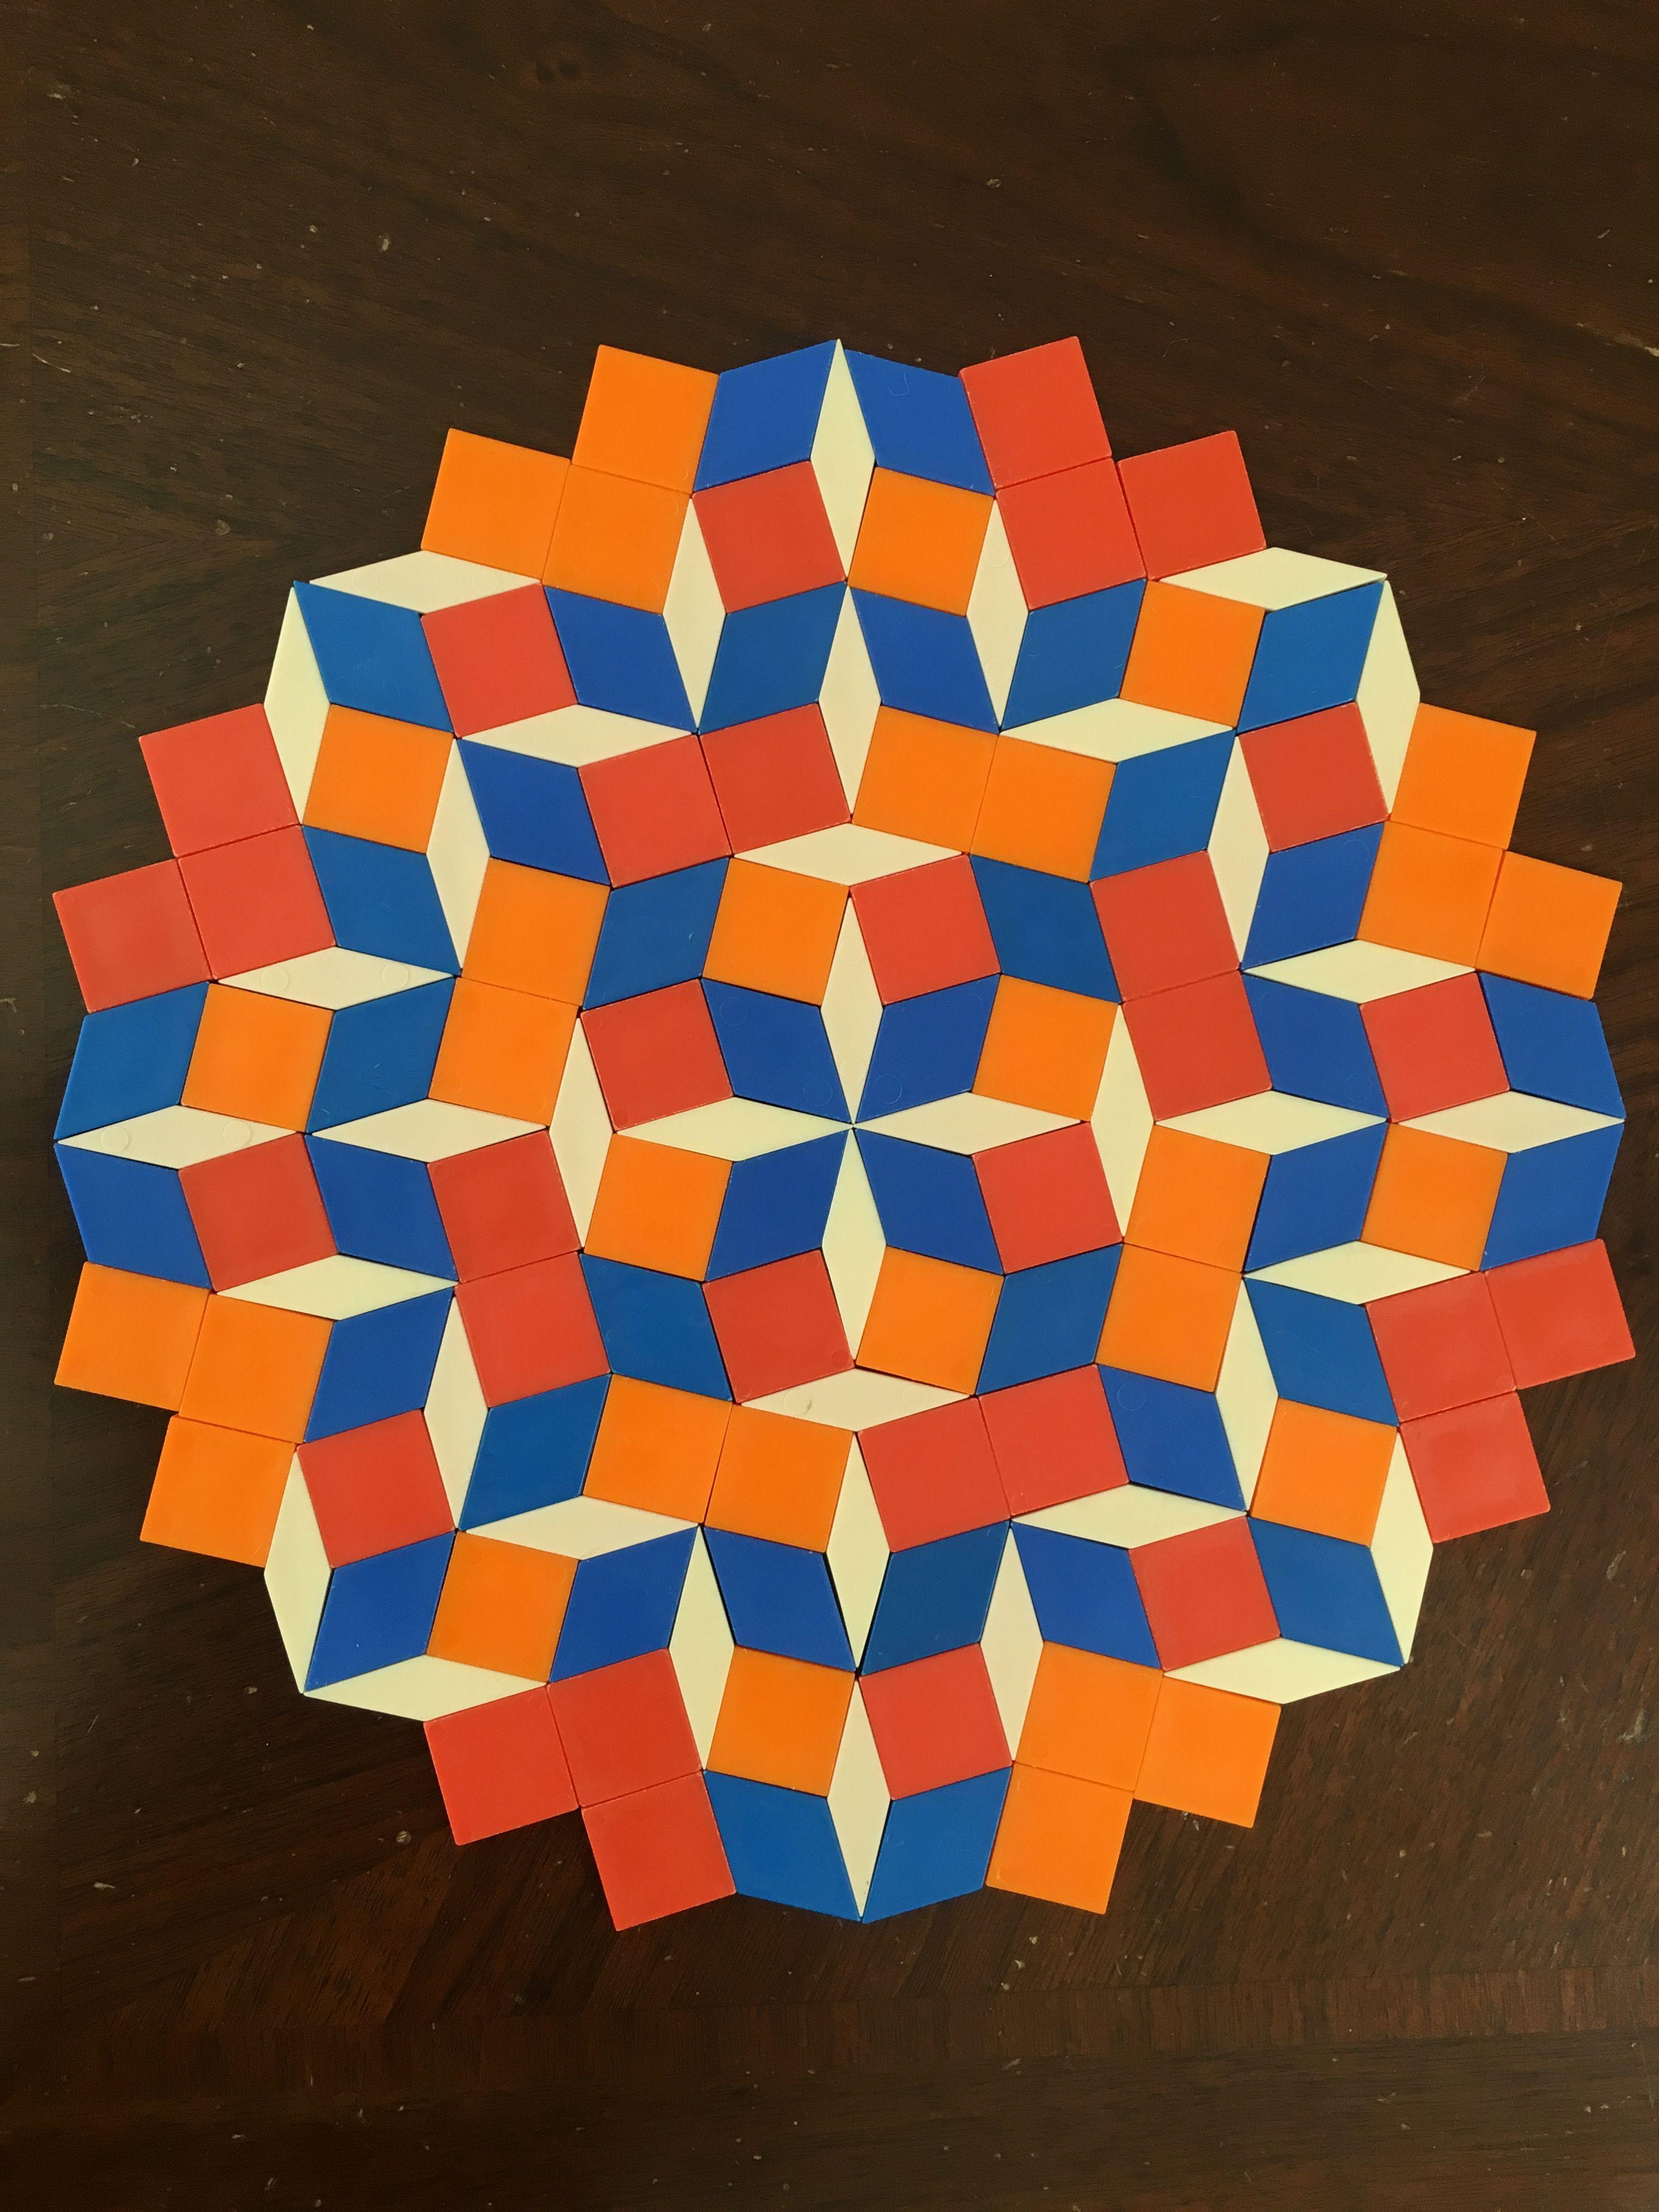 Mandala From 8 Fold Square Rhomb Tiling 2 Twisted